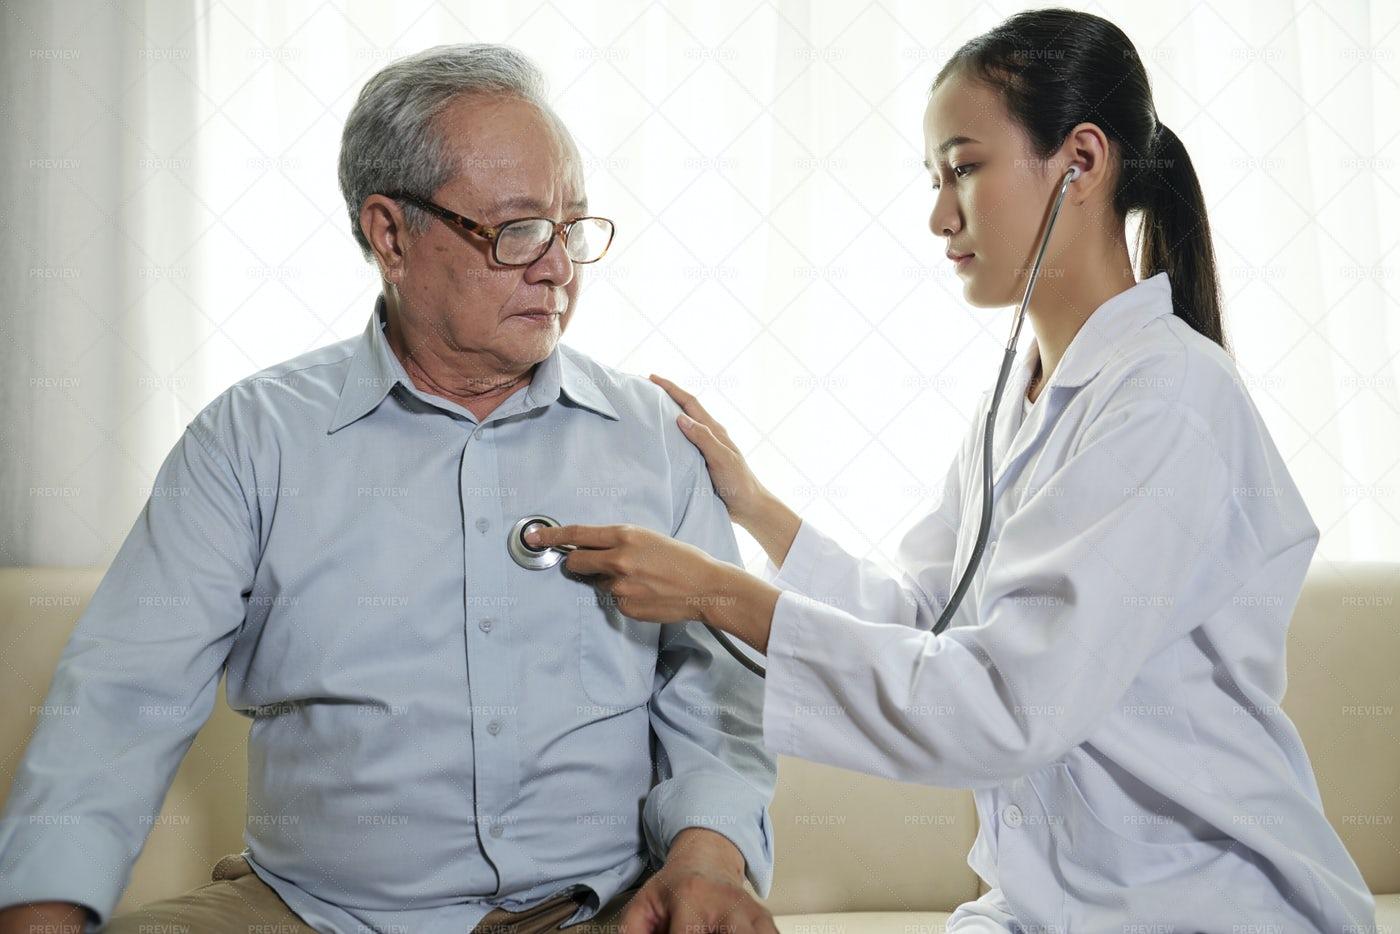 Doctor Listening To Her Patient: Stock Photos